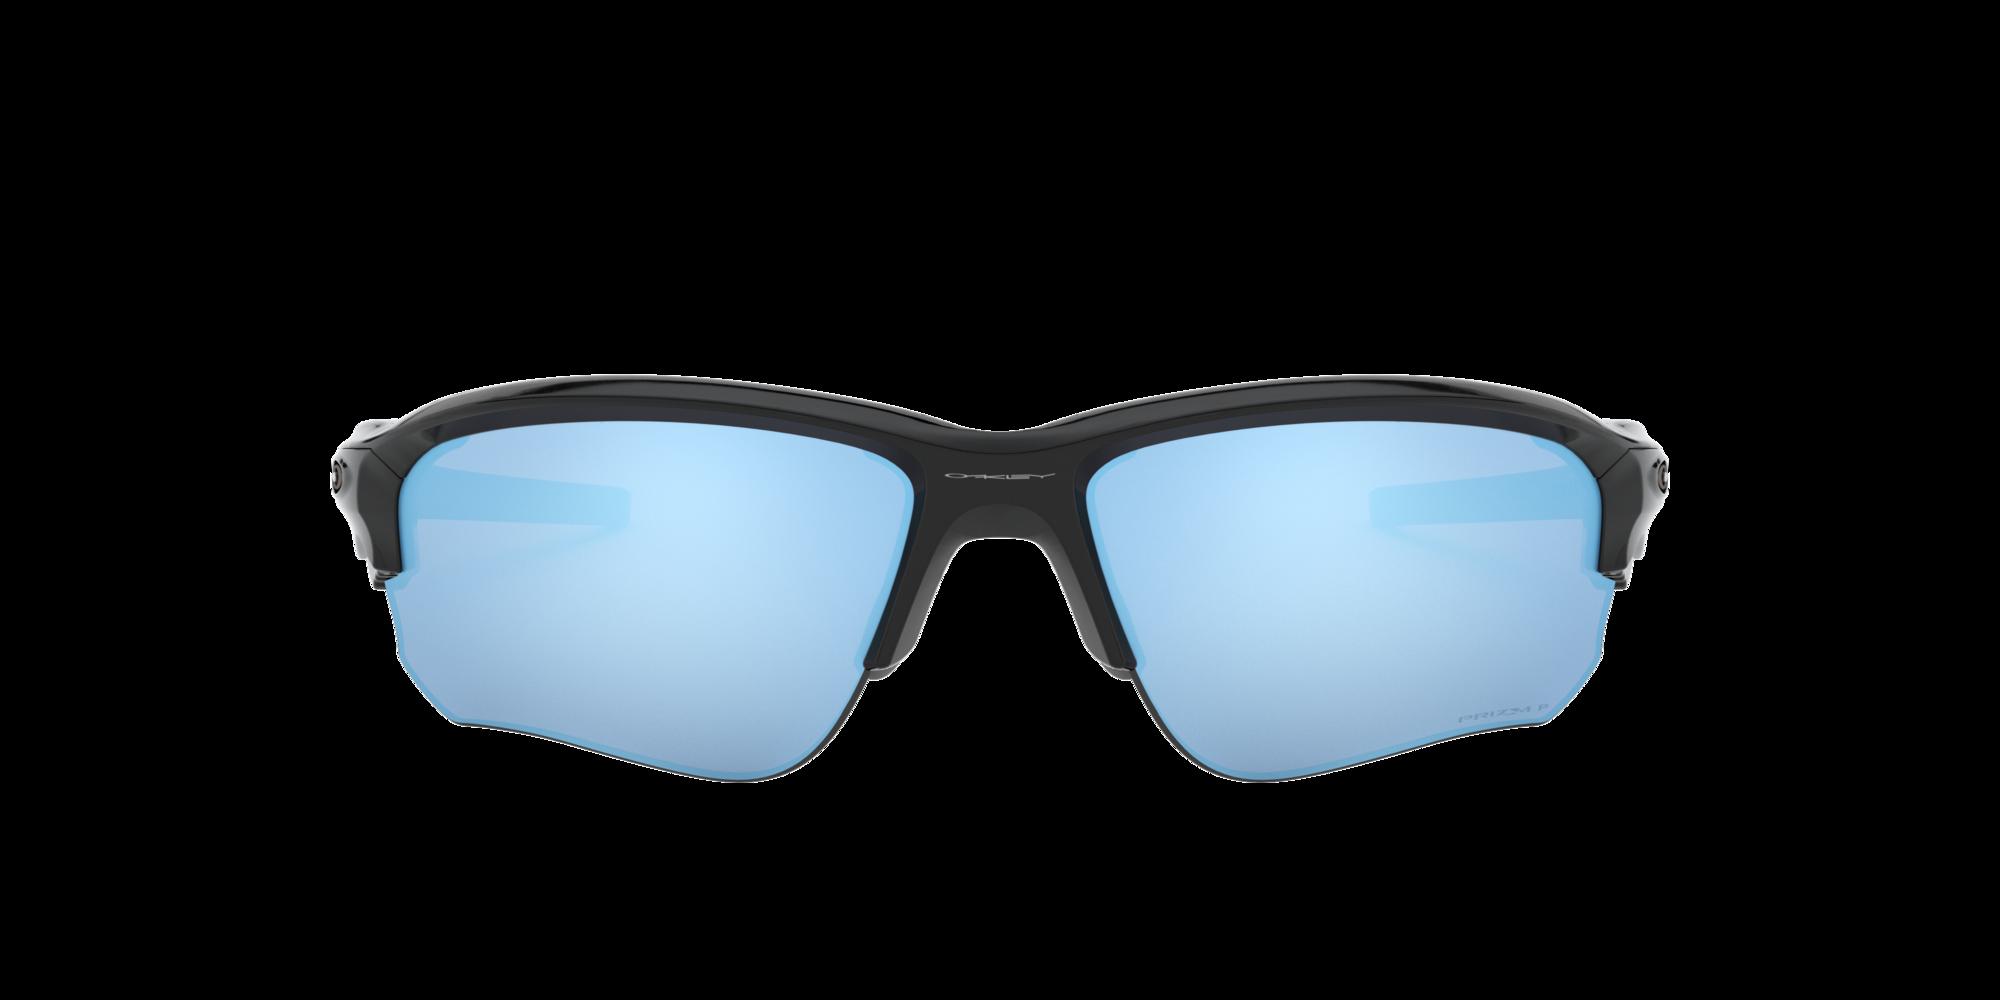 Image for OO9364 67 Flak Draft from LensCrafters | Glasses, Prescription Glasses Online, Eyewear